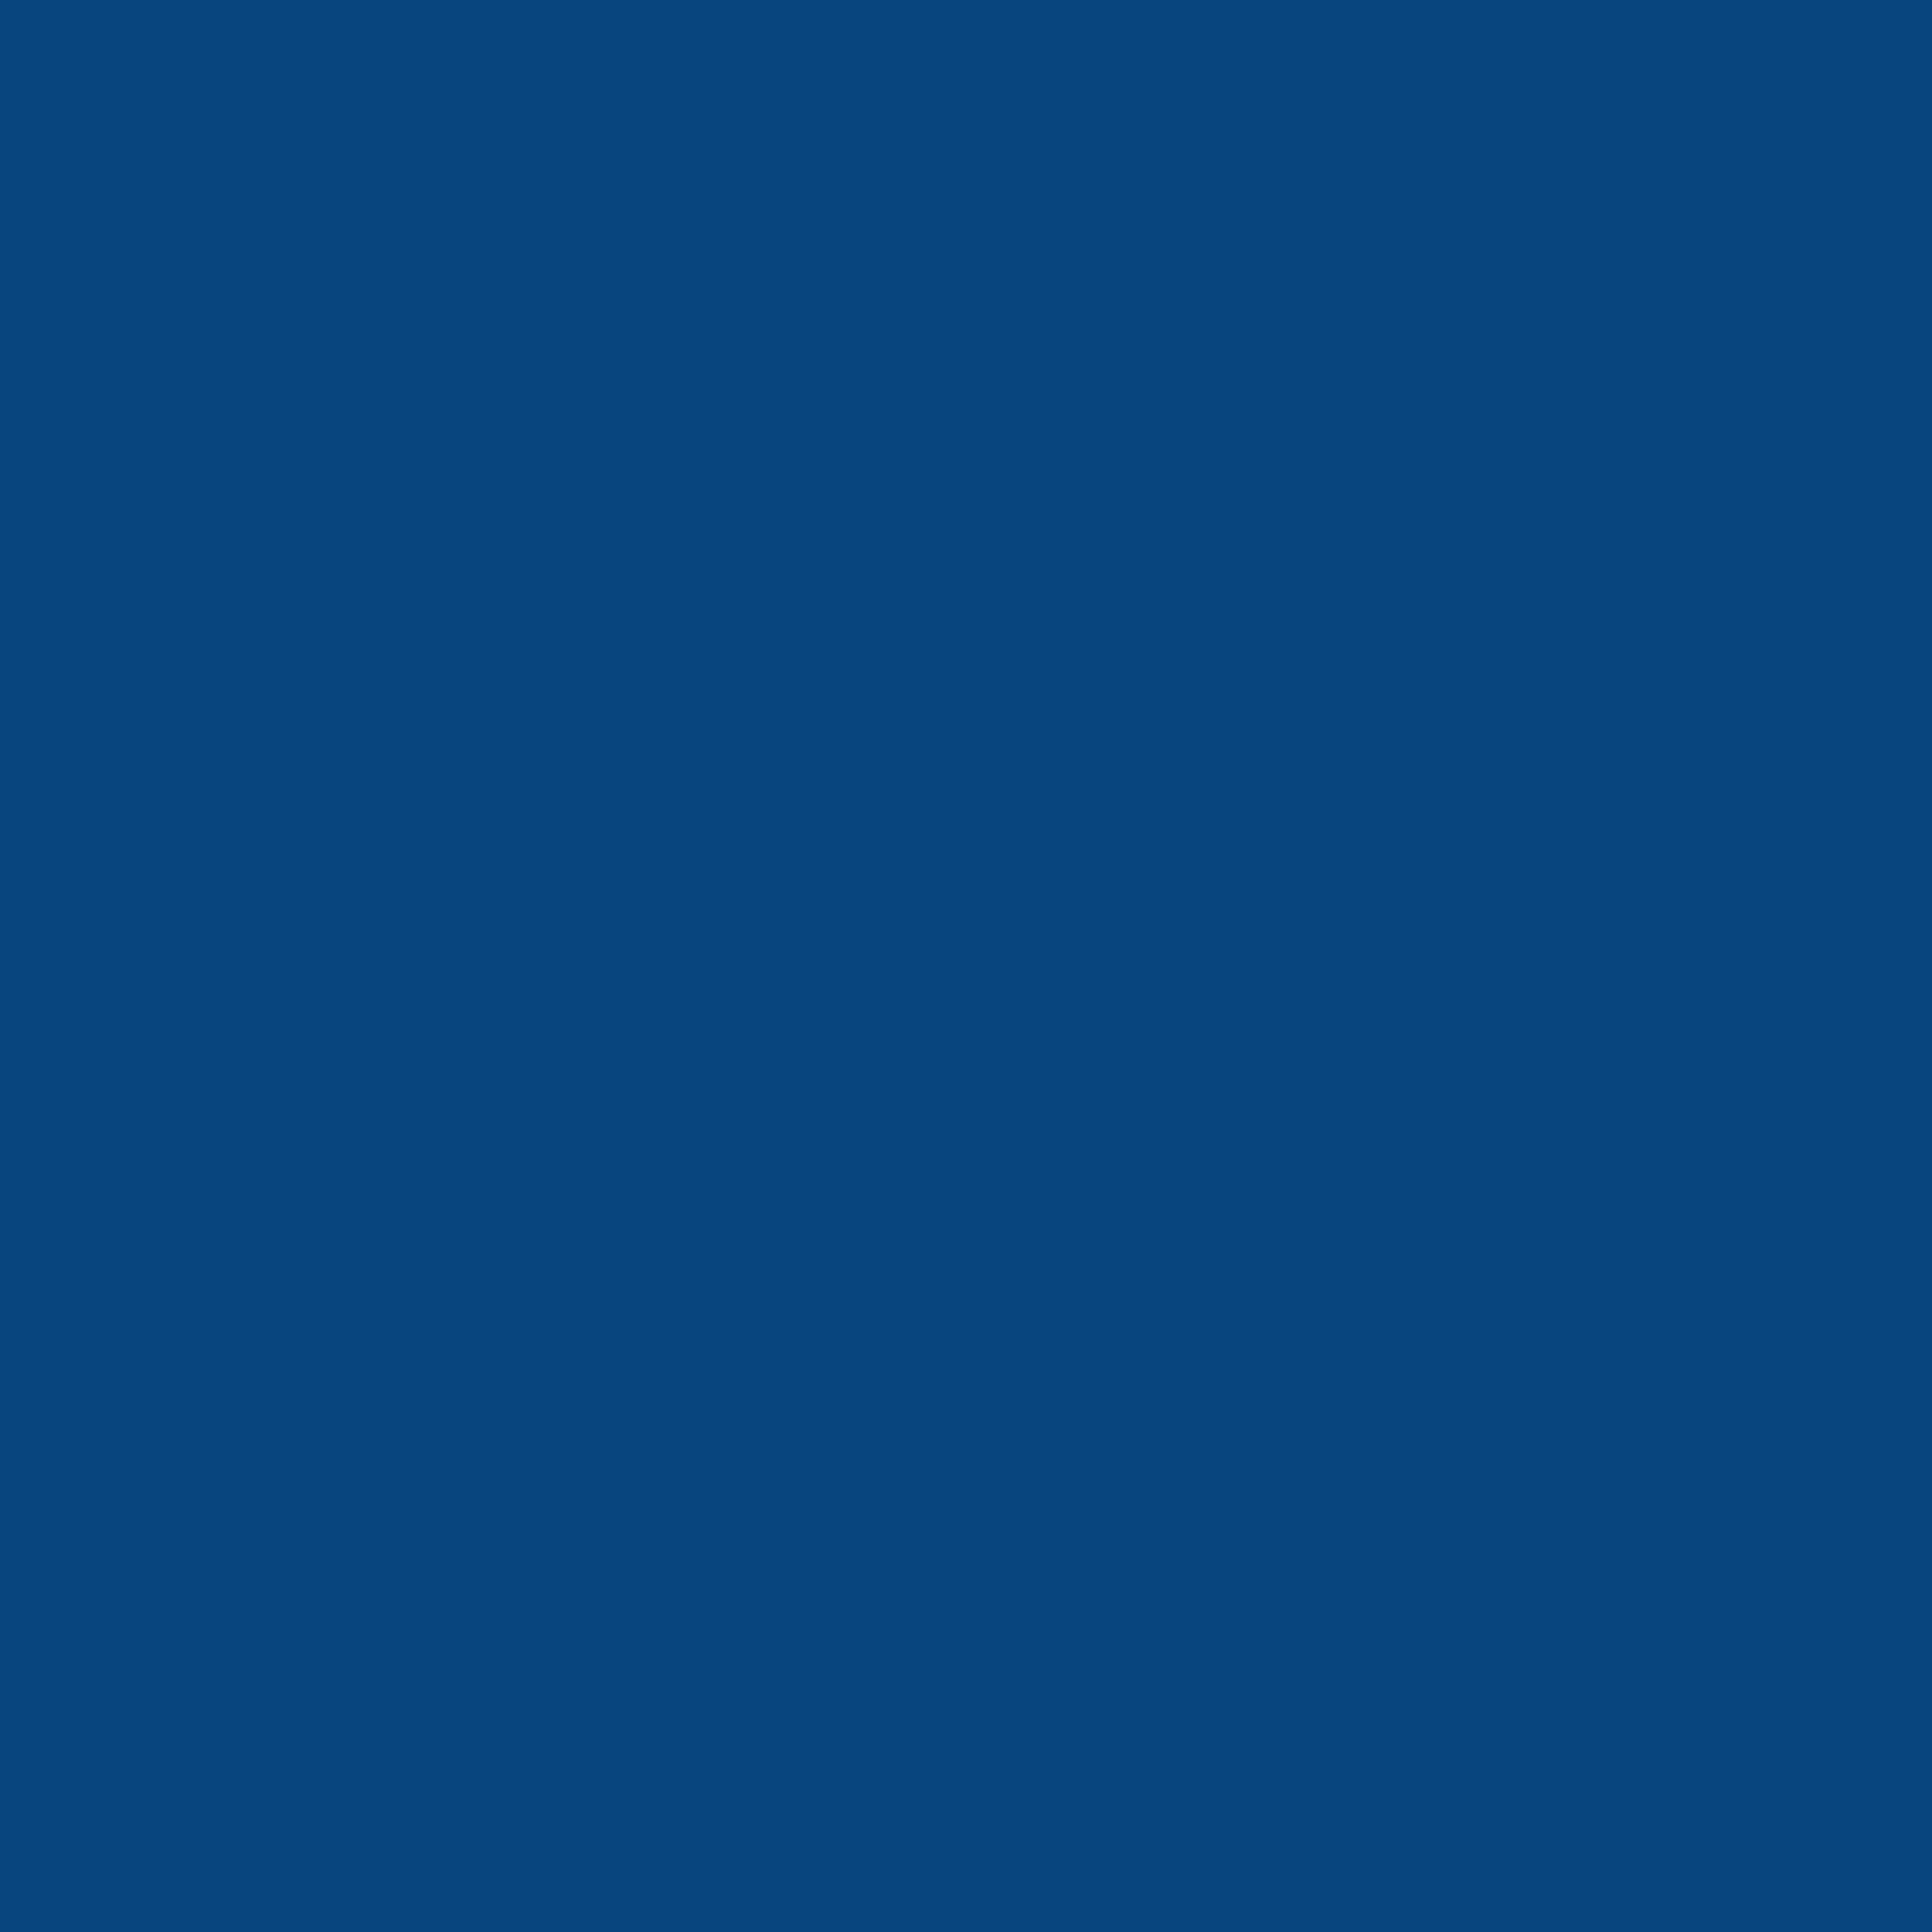 2048x2048 Dark Cerulean Solid Color Background